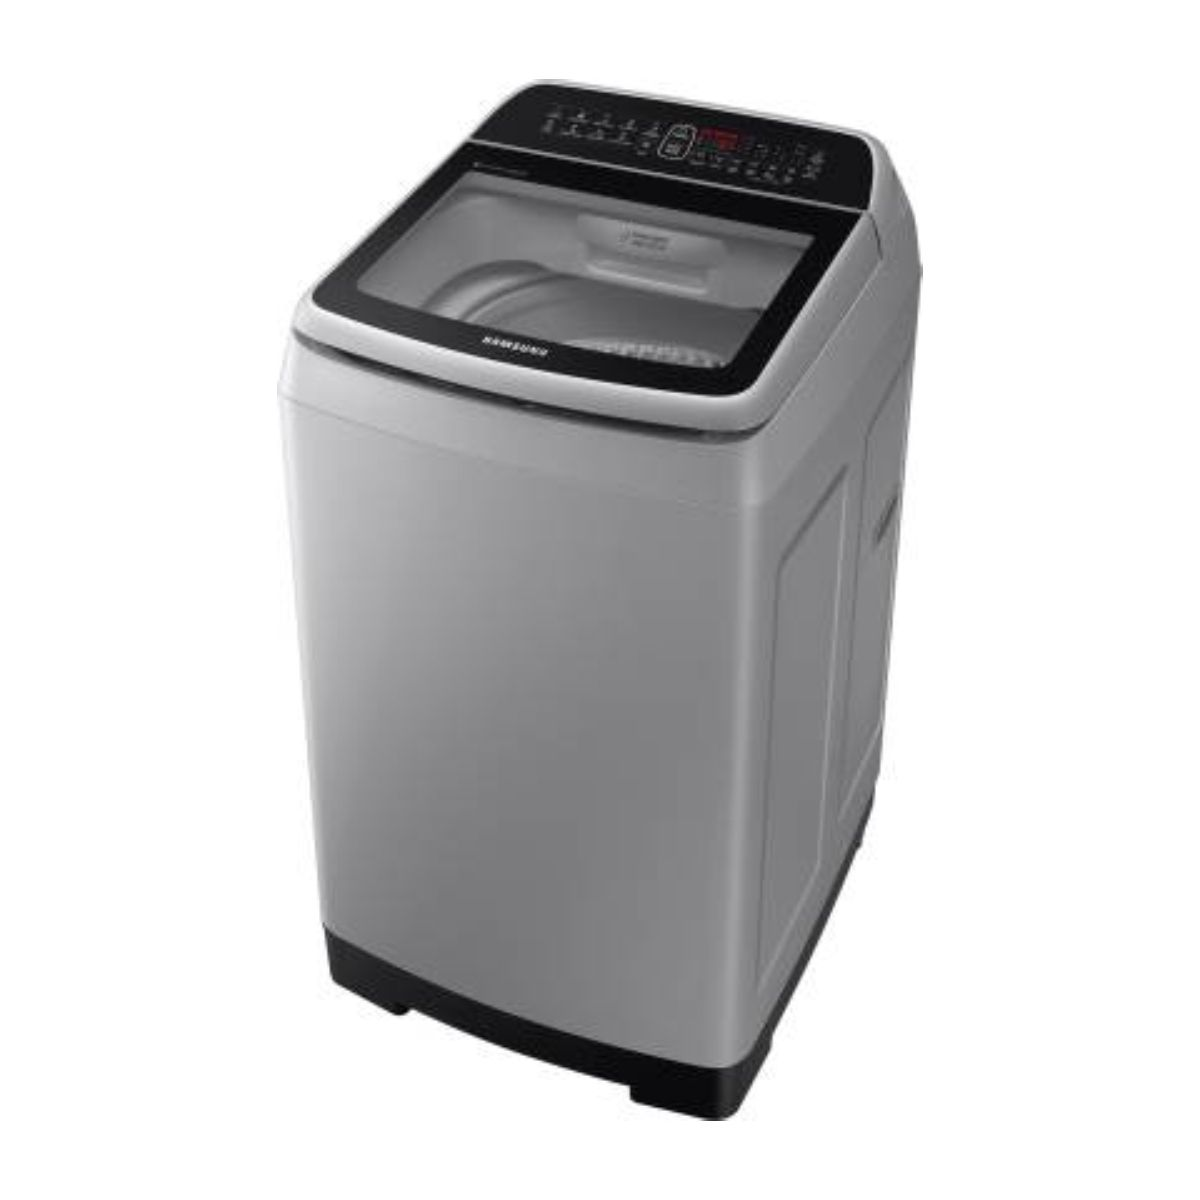 Redmi Smart टीवी X50